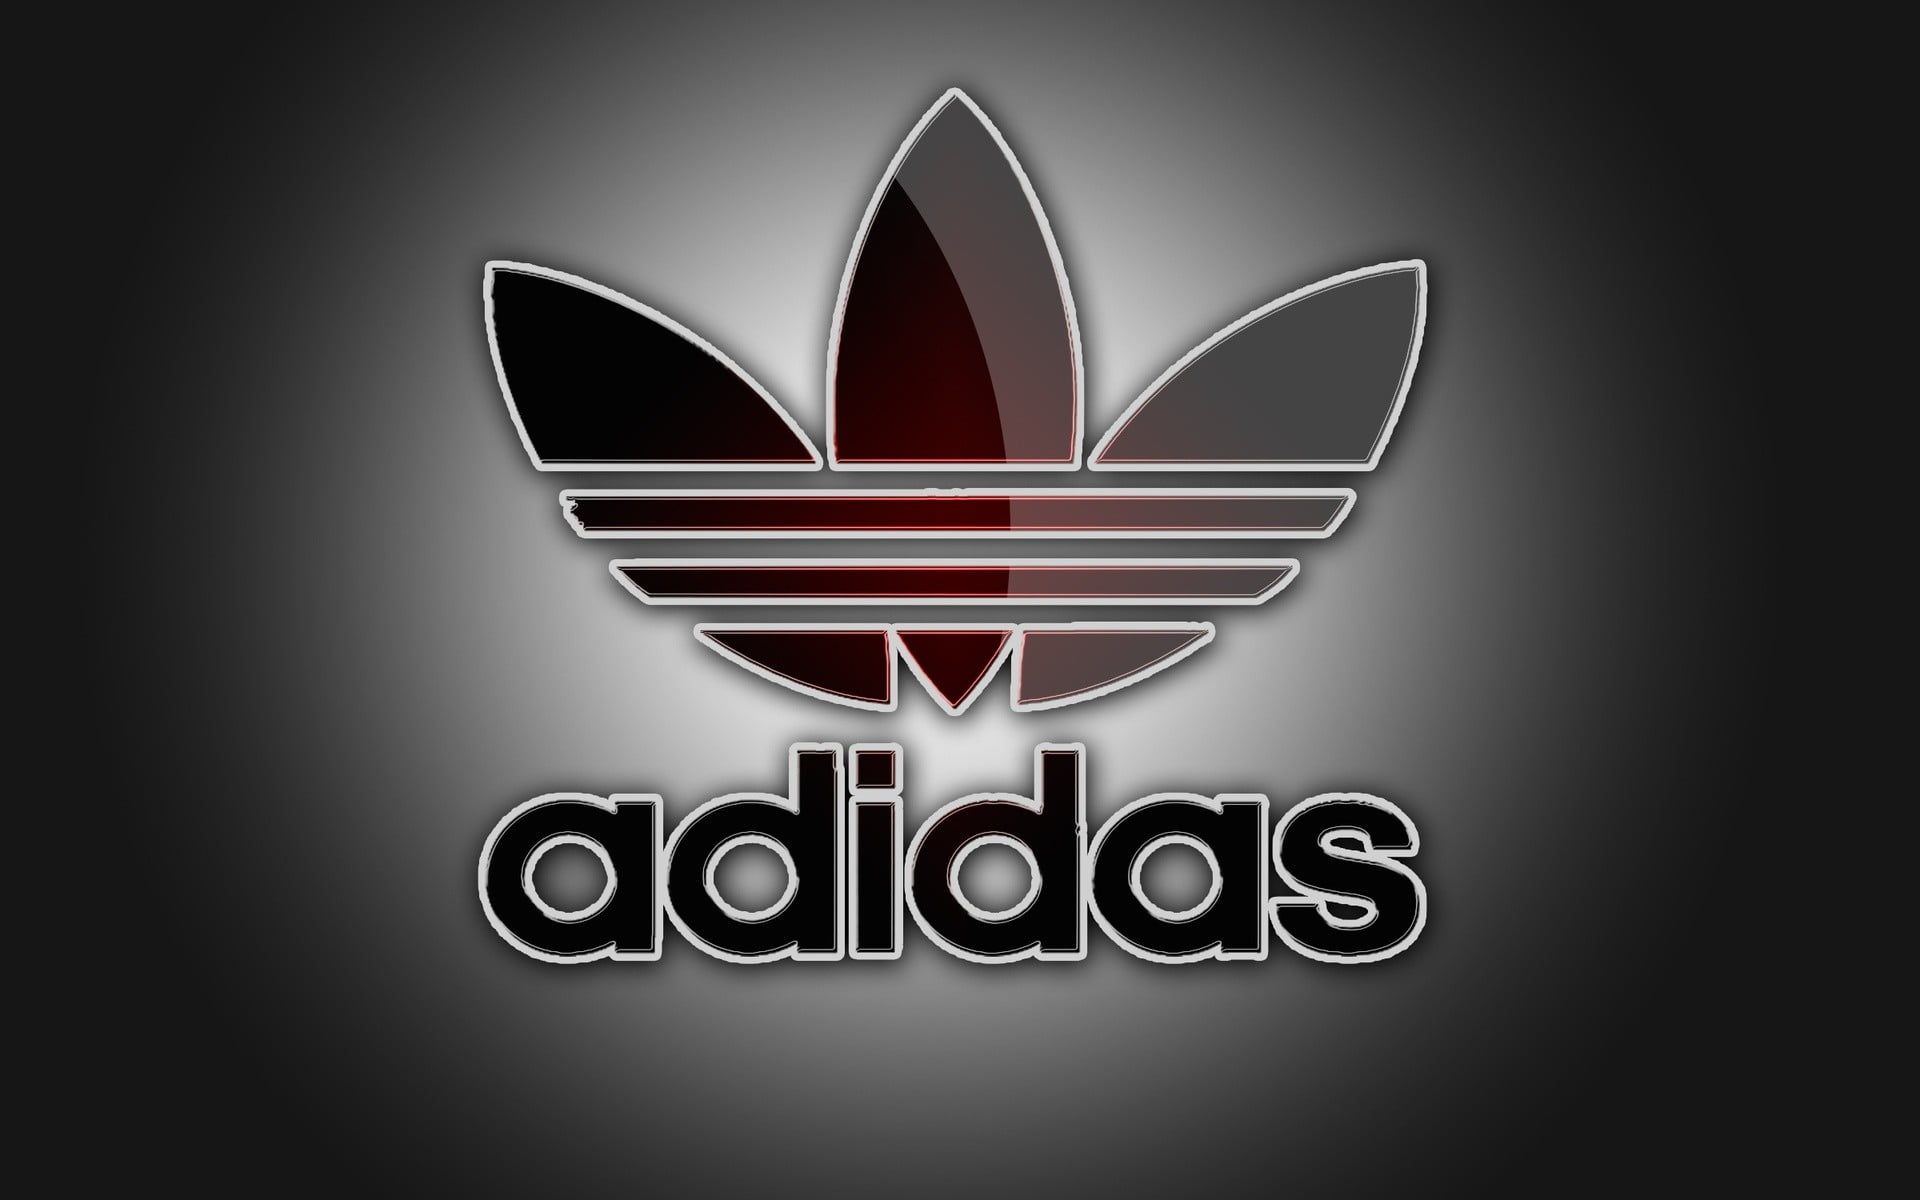 Brand Logo Adidas 1080p Wallpaper Hdwallpaper Desktop Adidas Logo Wallpapers Adidas Iphone Wallpaper Adidas Wallpapers